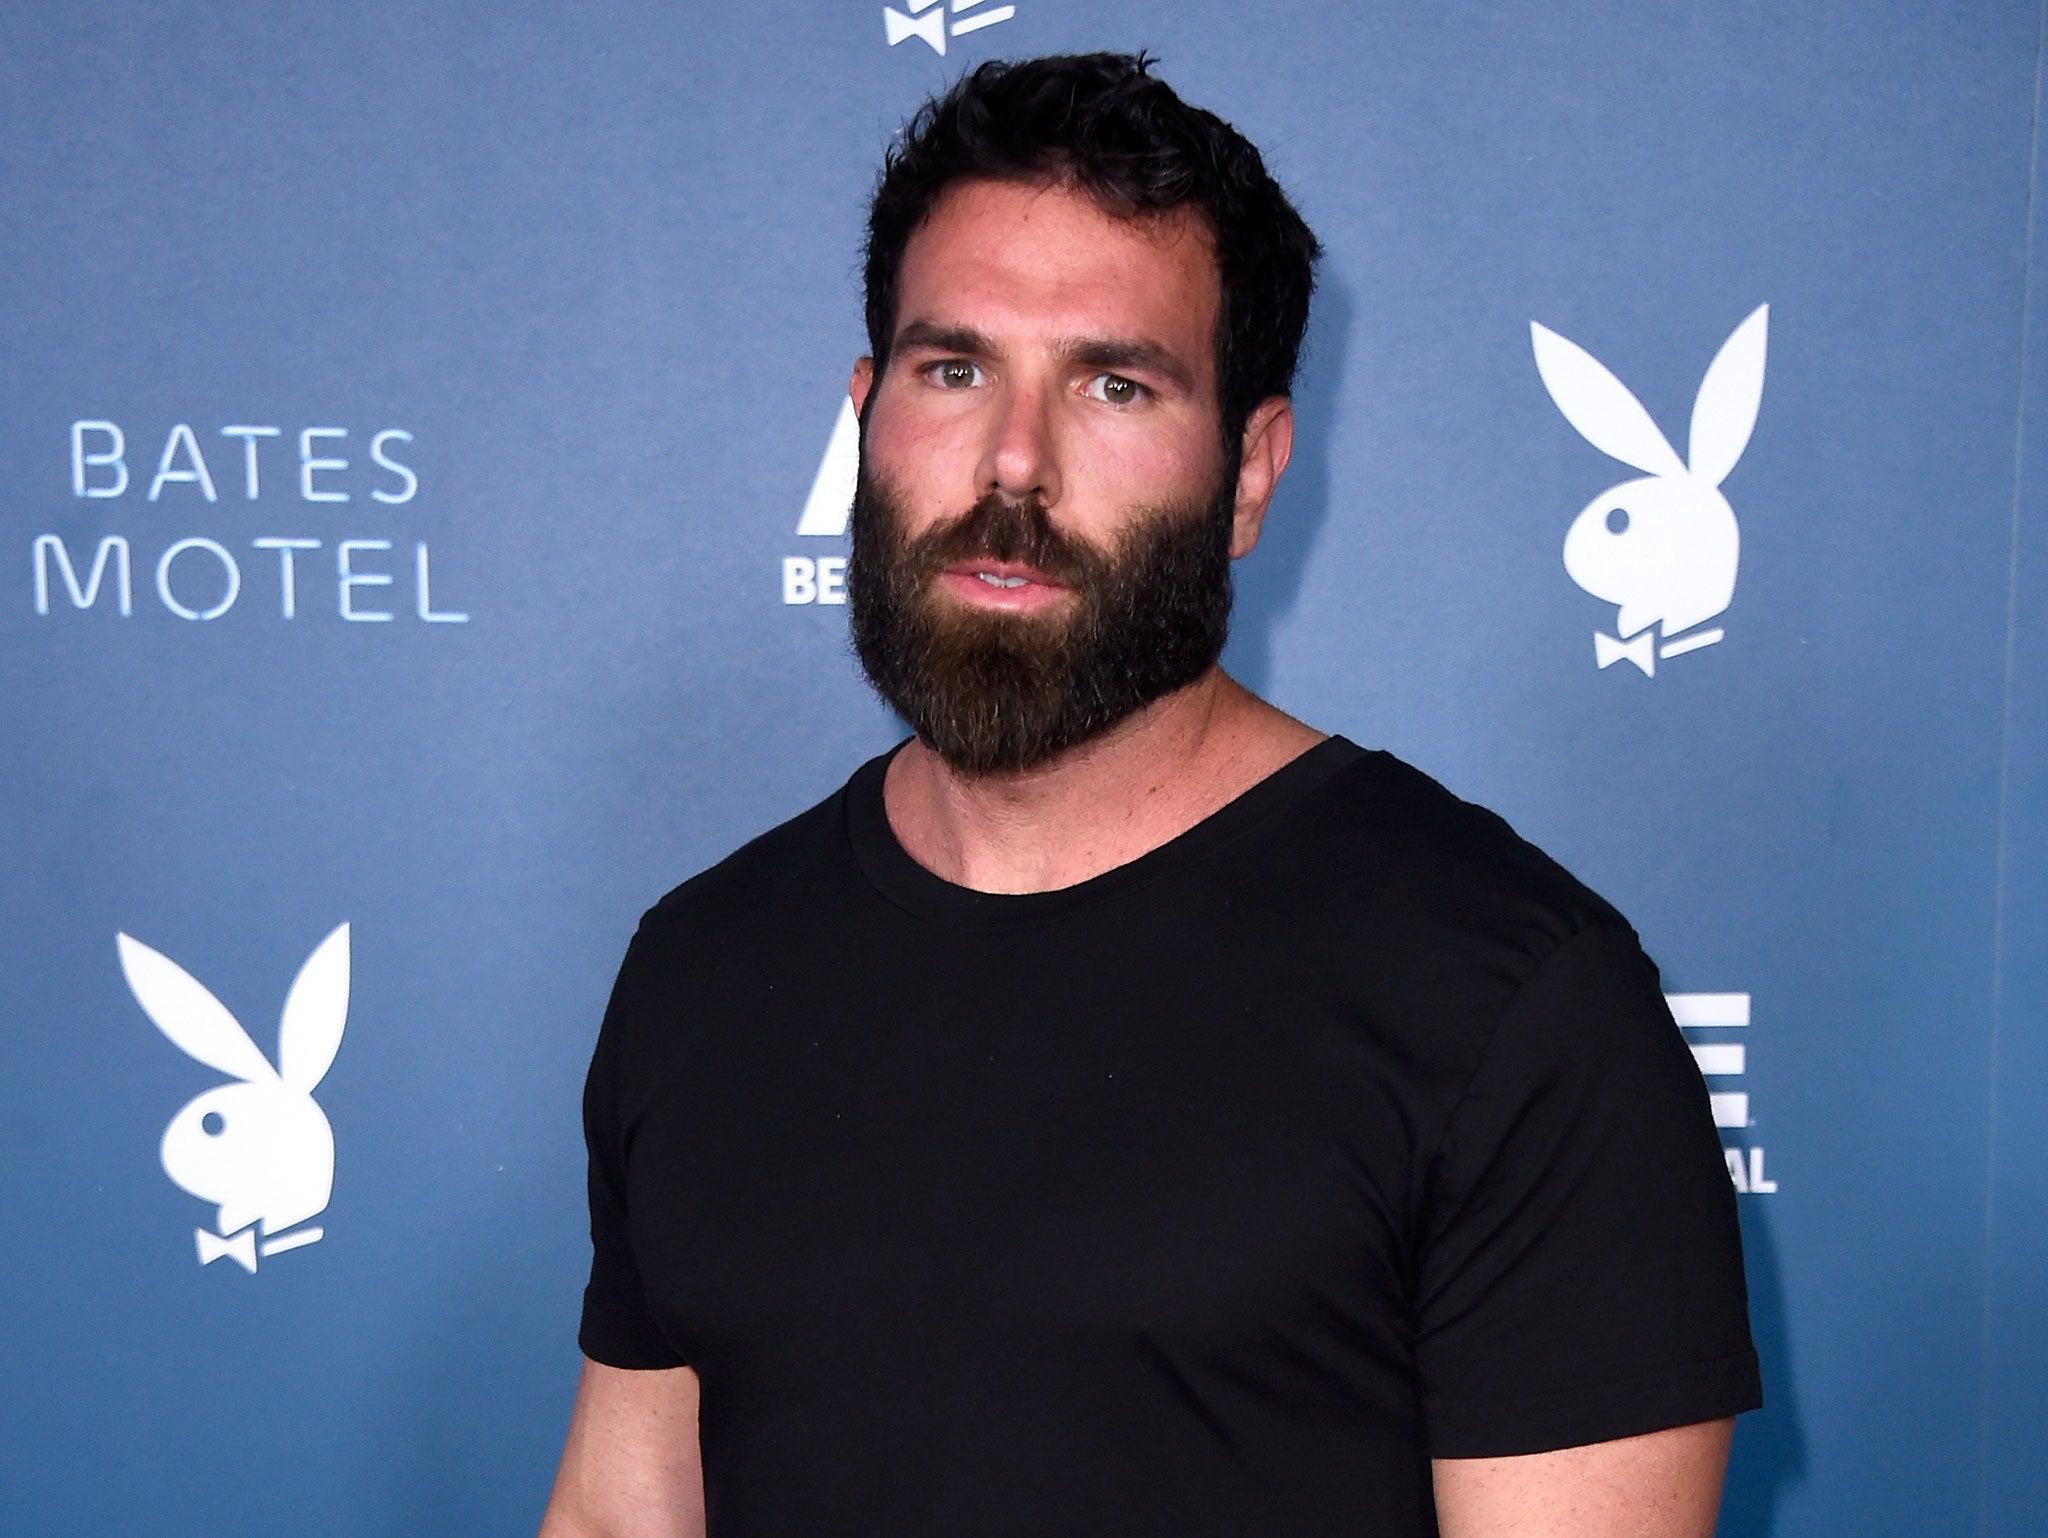 Dan Bilzerian Named GGPoker's New Ambassador